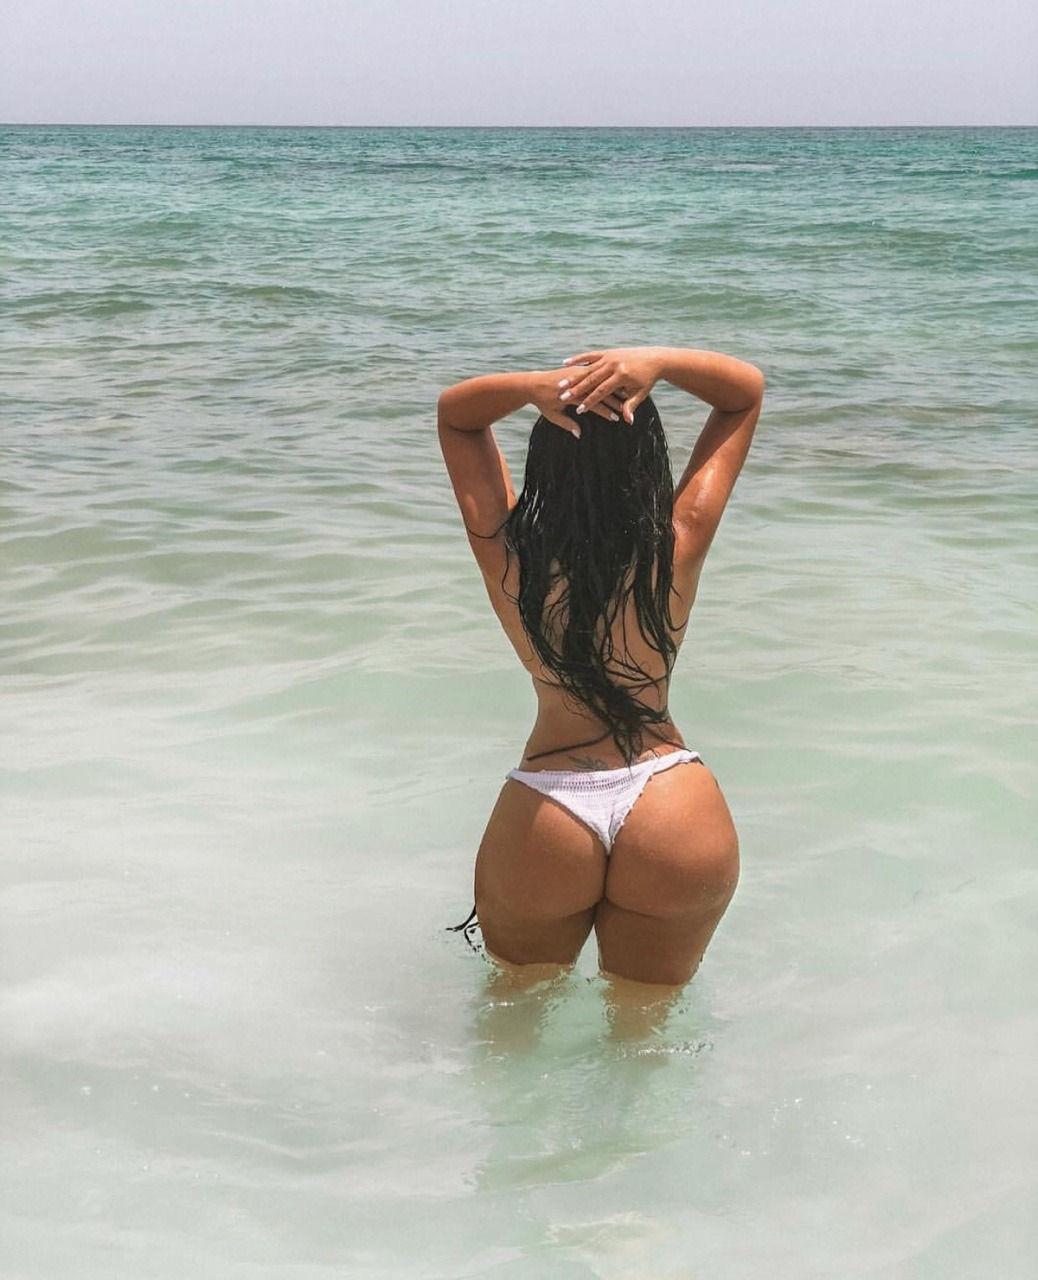 Beach body …😚😚